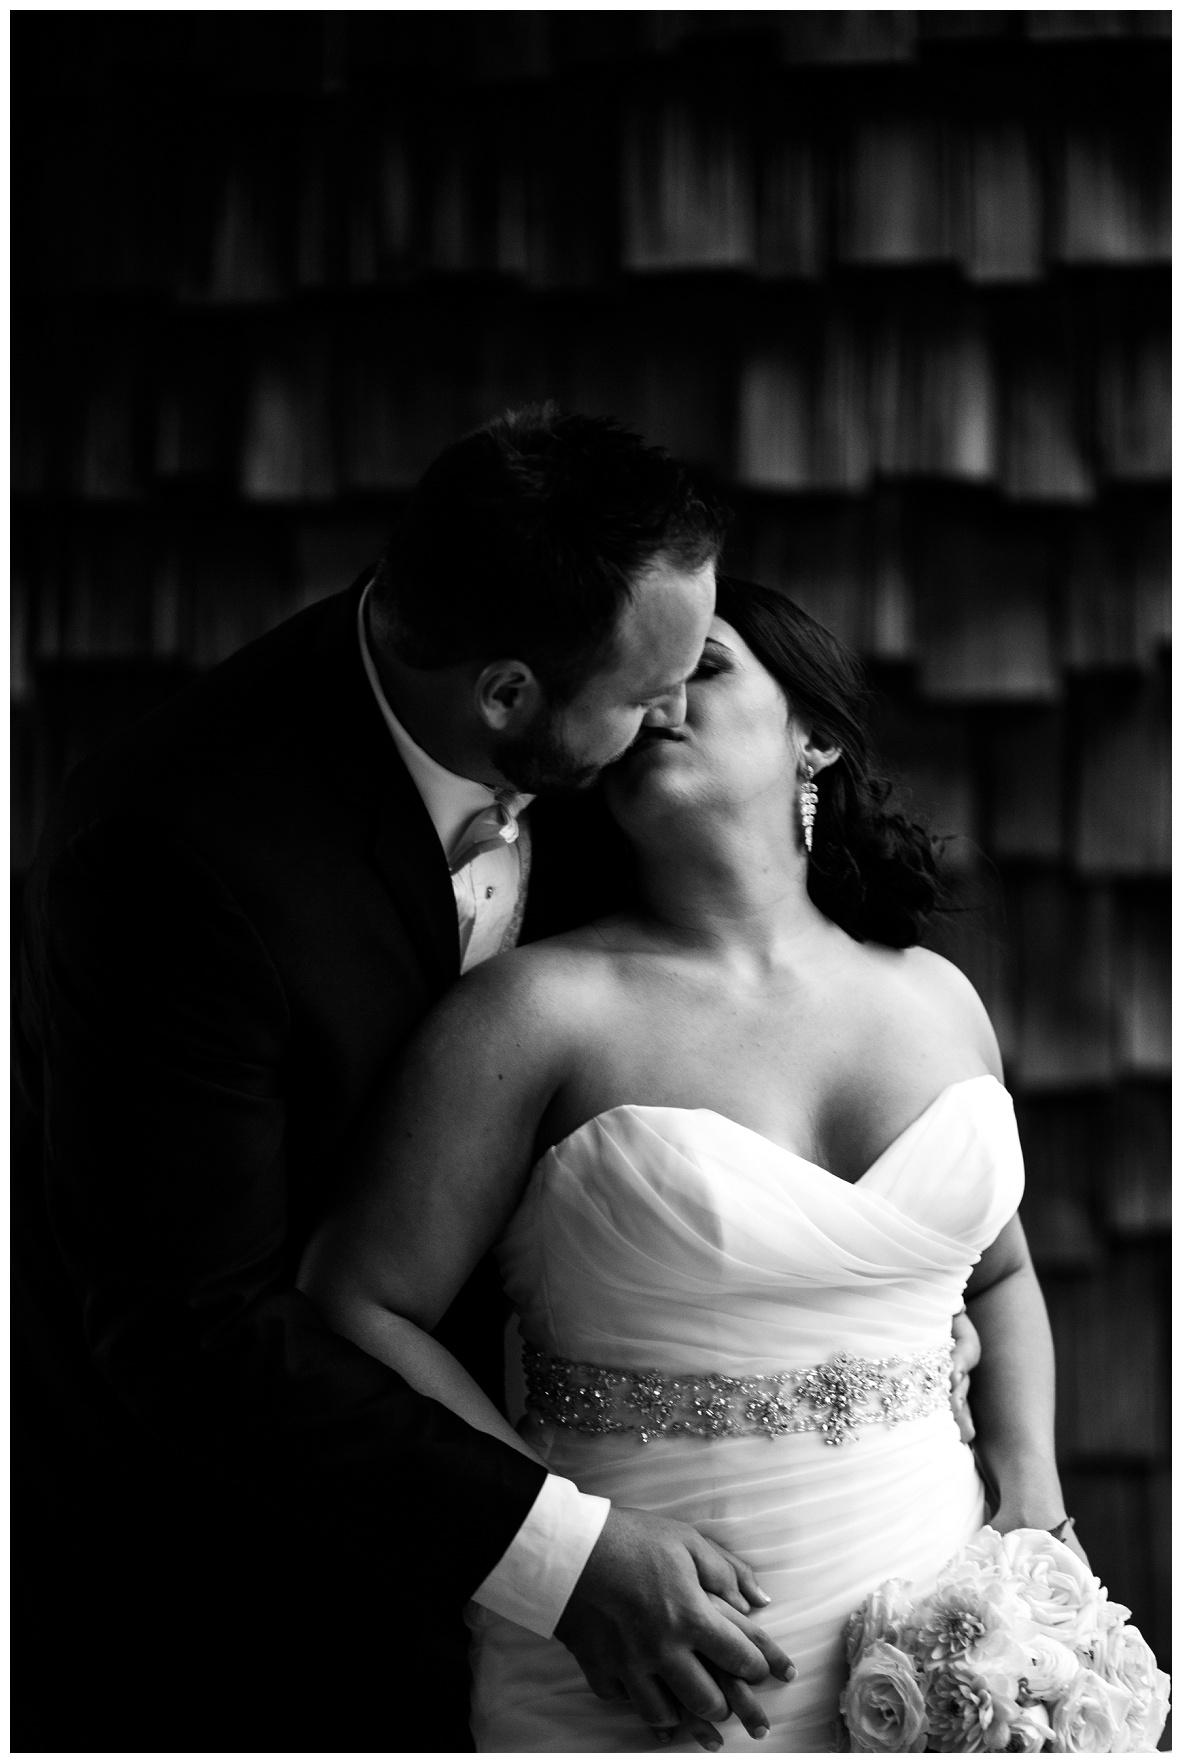 Mr. and Mrs. Hornyak_0074m (4).jpg